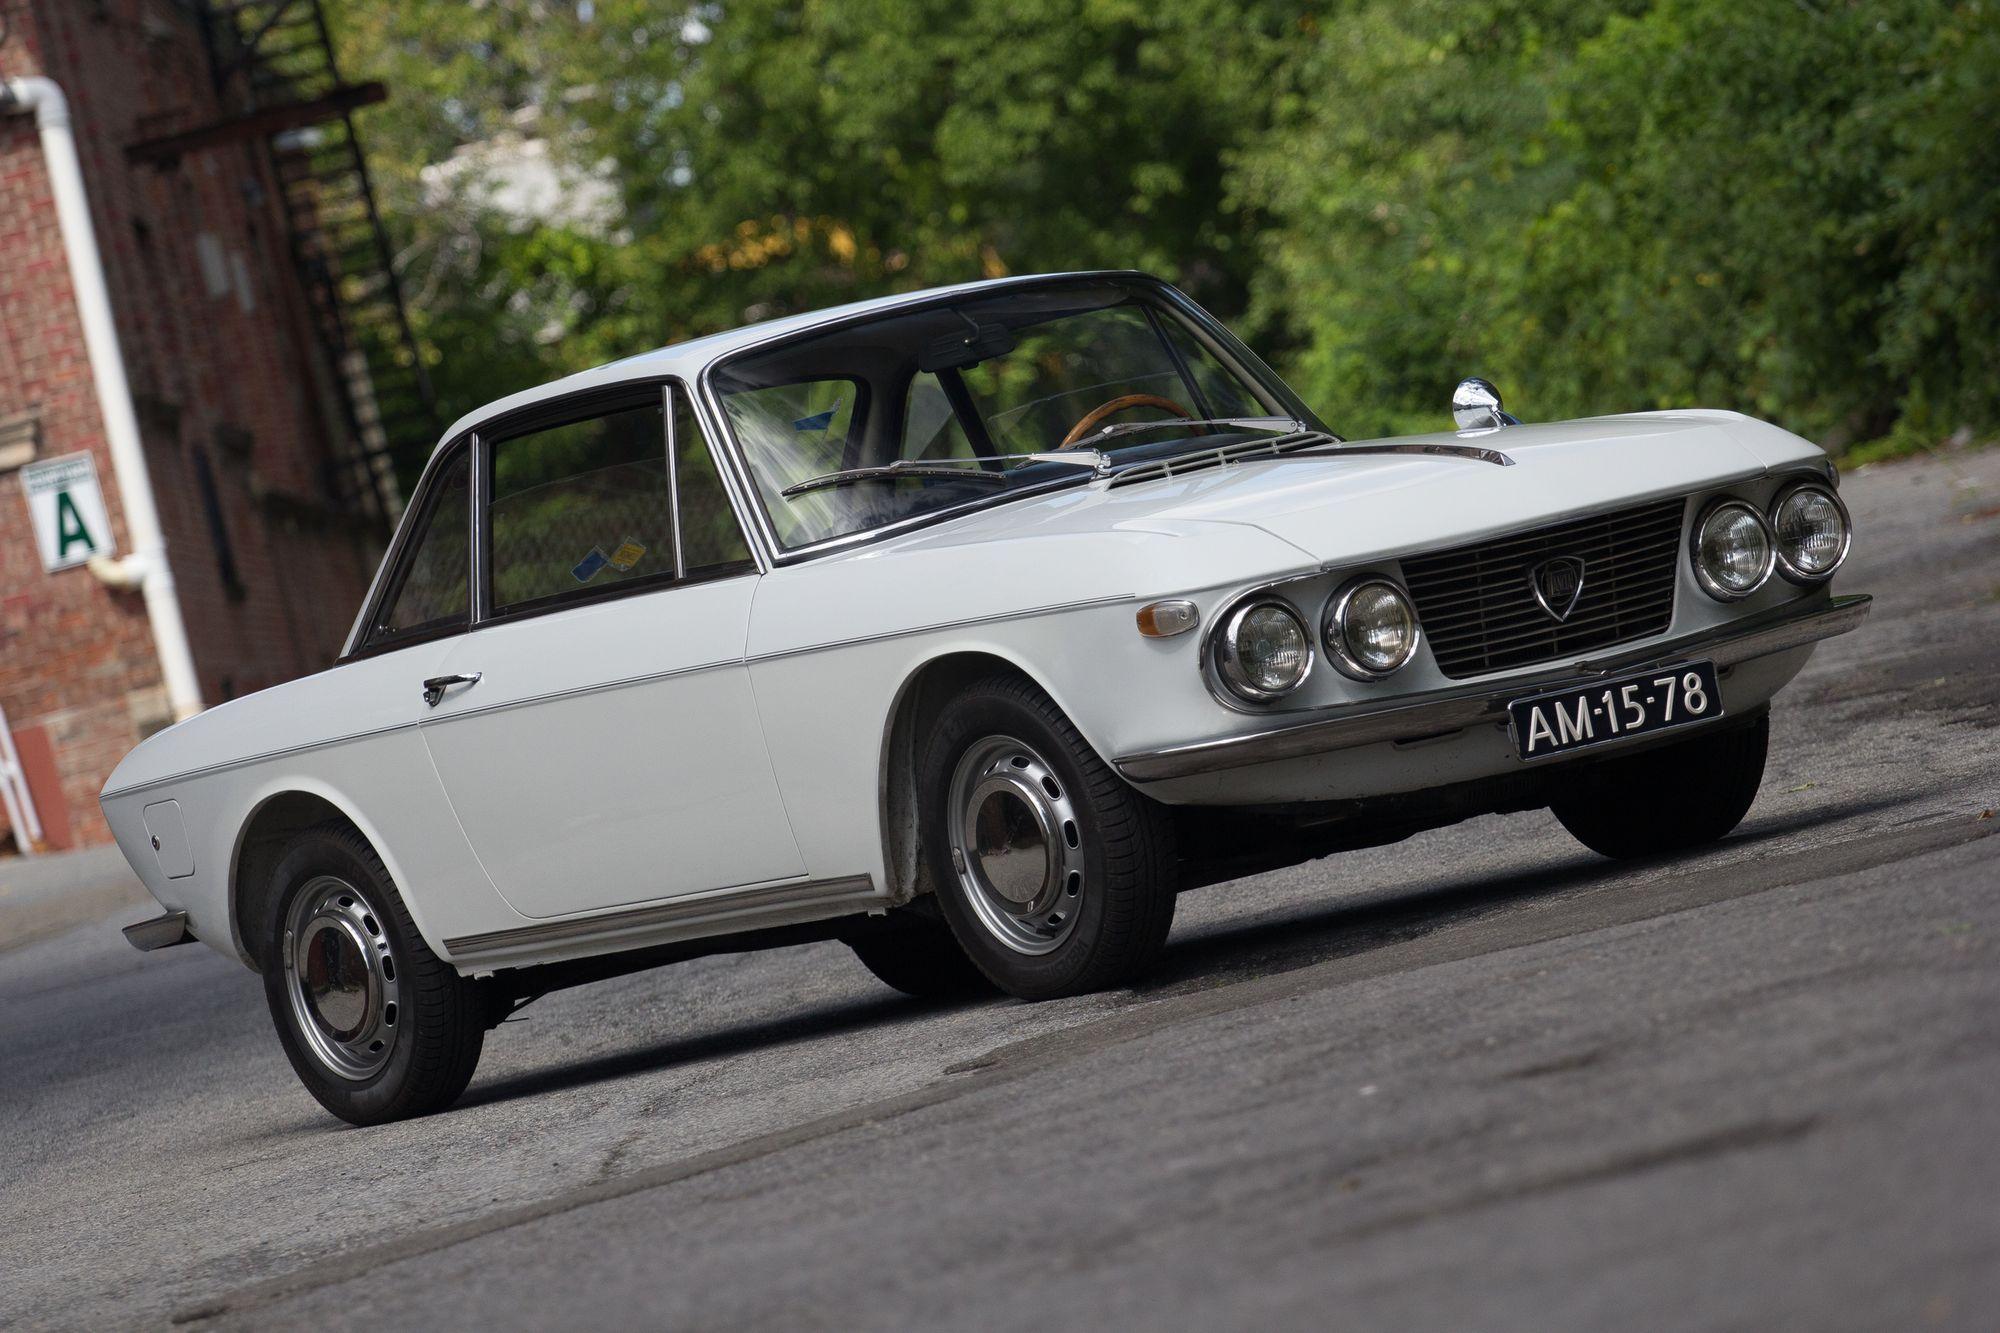 1968 Lancia Fulvia Coupe Series I 24 900 Avec Images